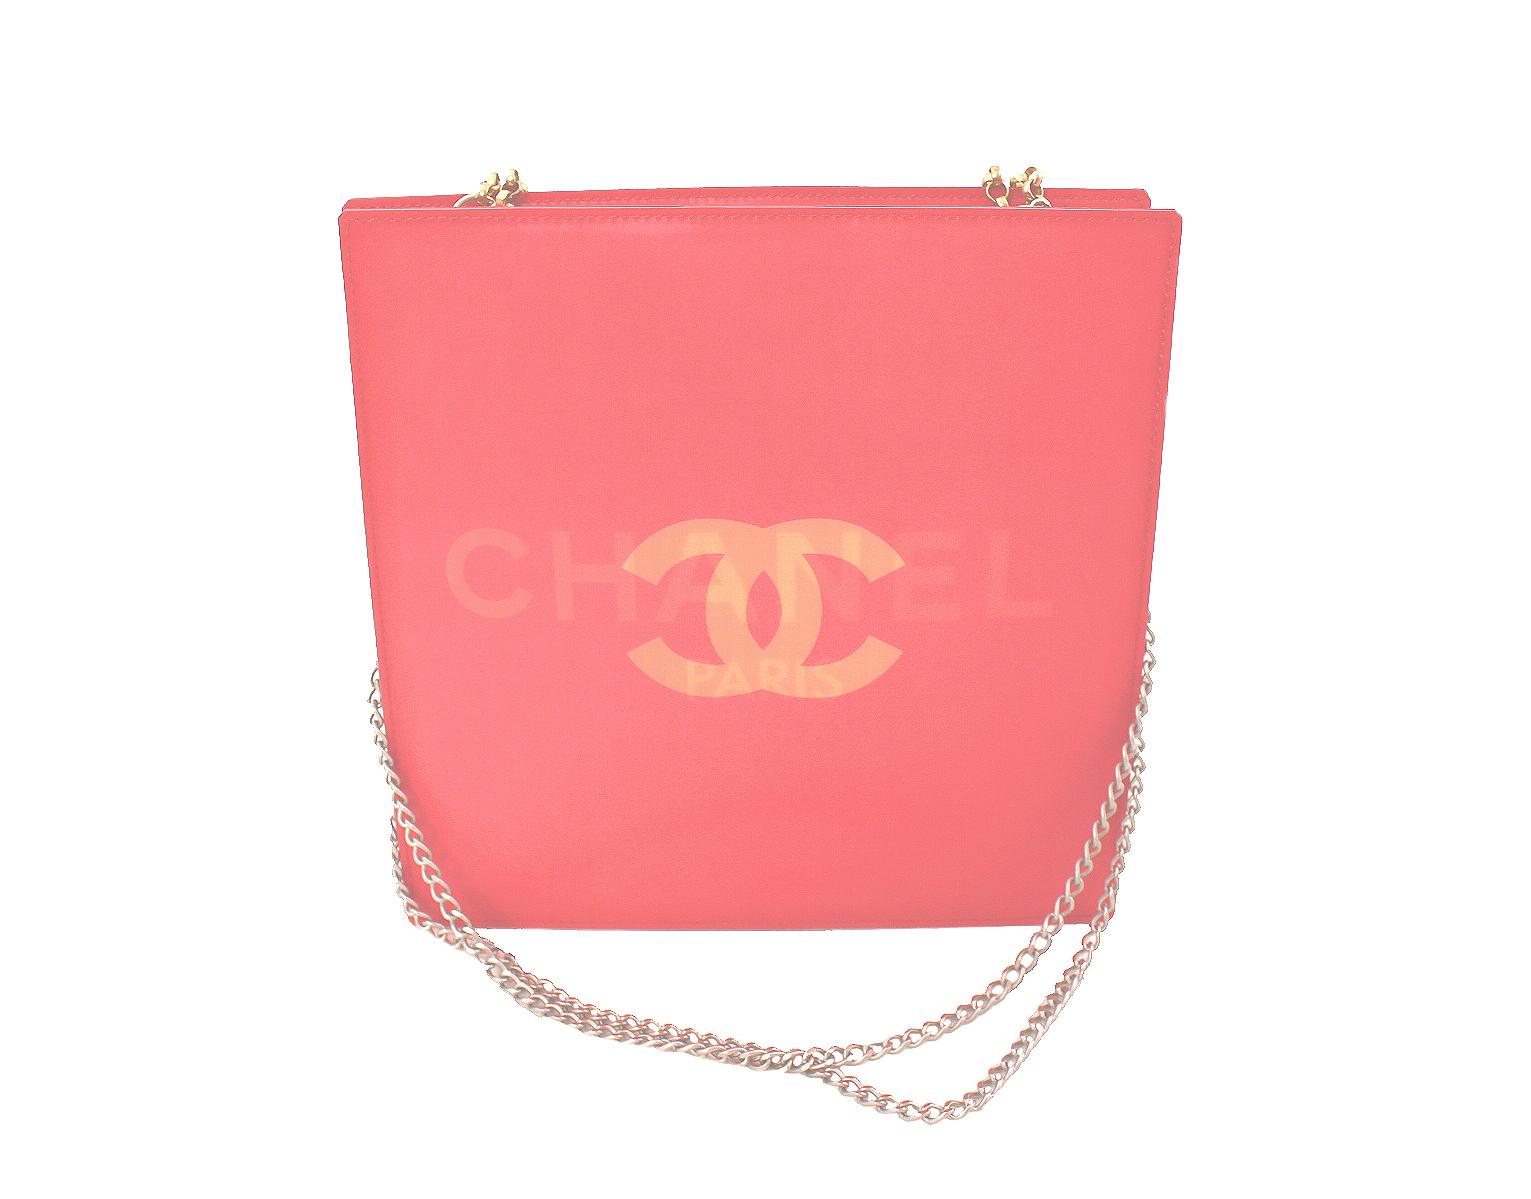 e959fc1afd18 vintage-Chanel-hologram-purse-shoulder-bag_03 Chanel red hologram vintage shoulder  bag ...